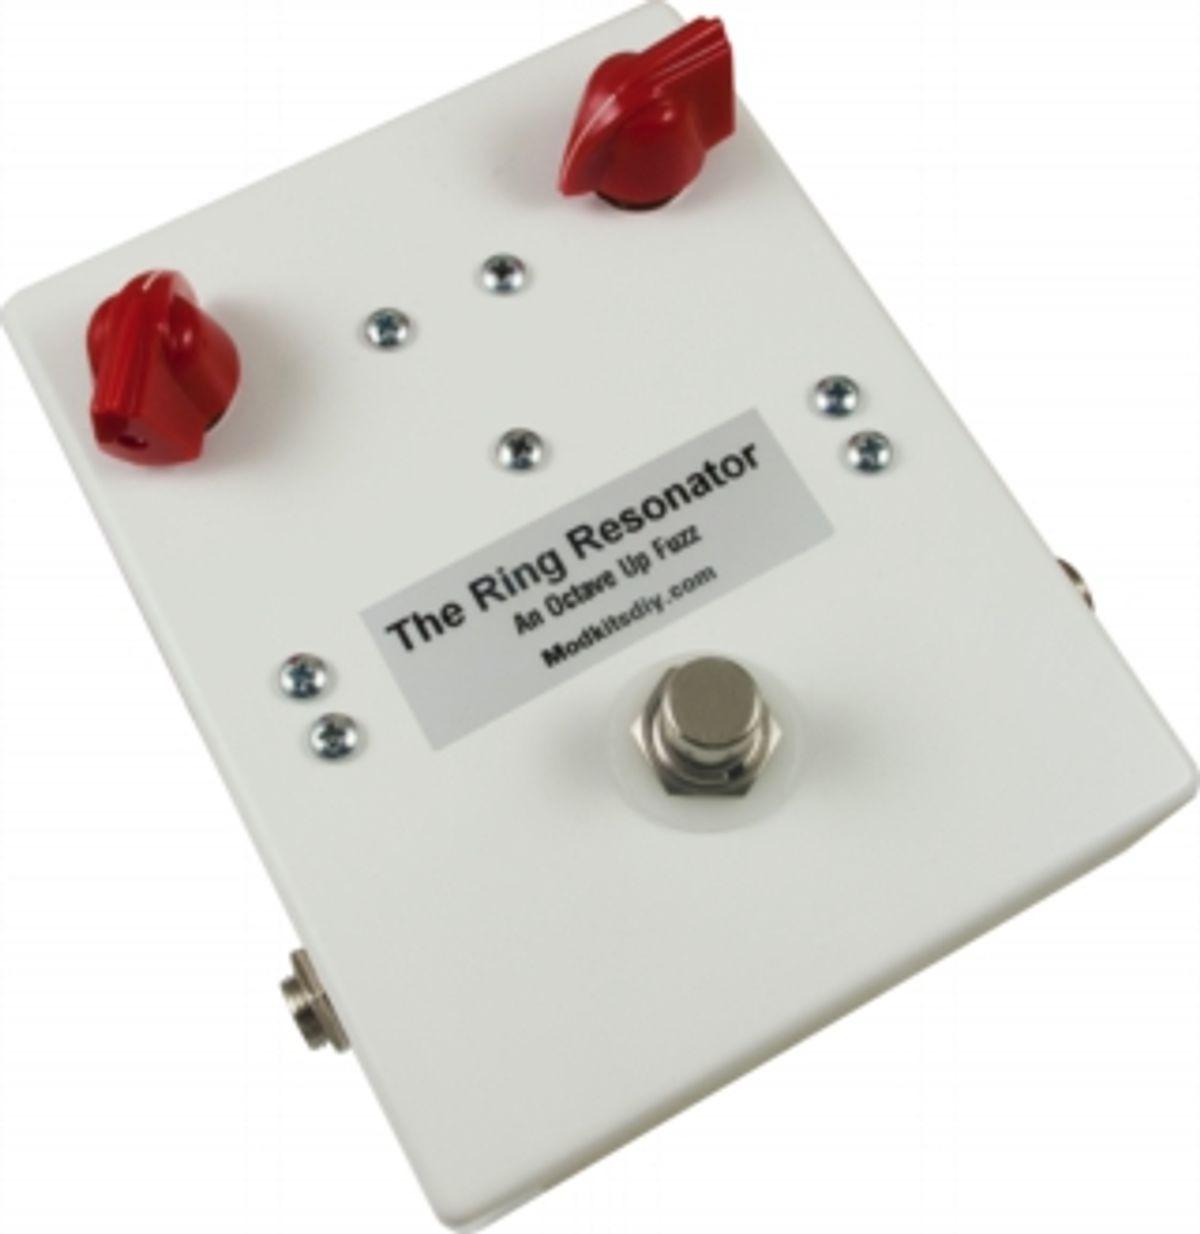 MOD Kits DIY Releases Rig Resonator